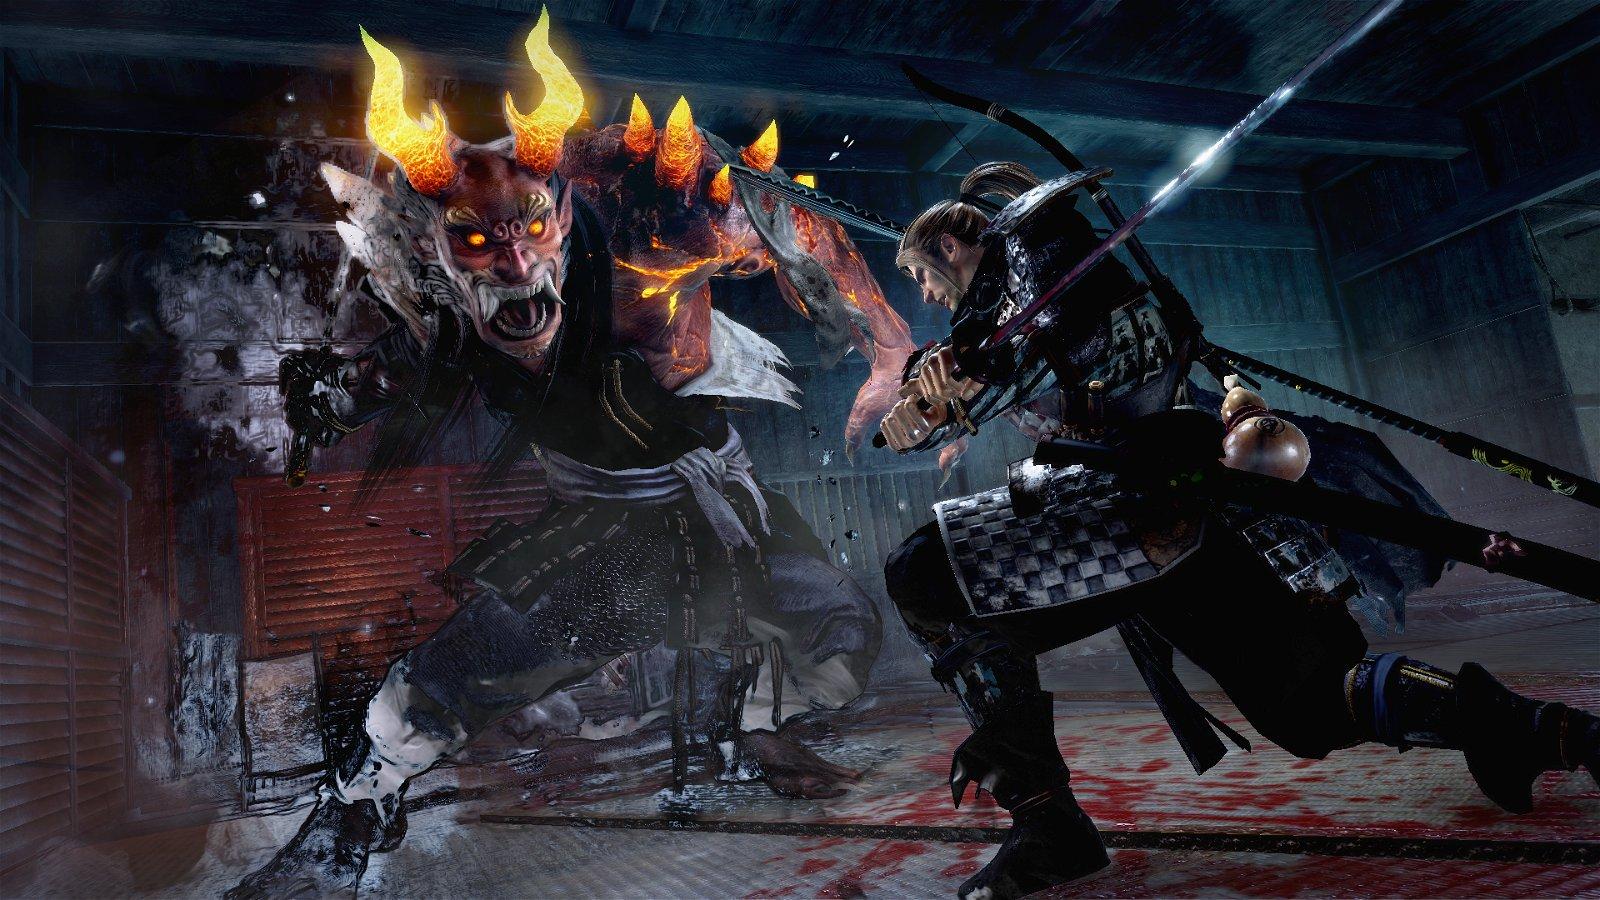 Nioh: Complete Edition (PC) Review - Samurai Souls Comes to PC 6